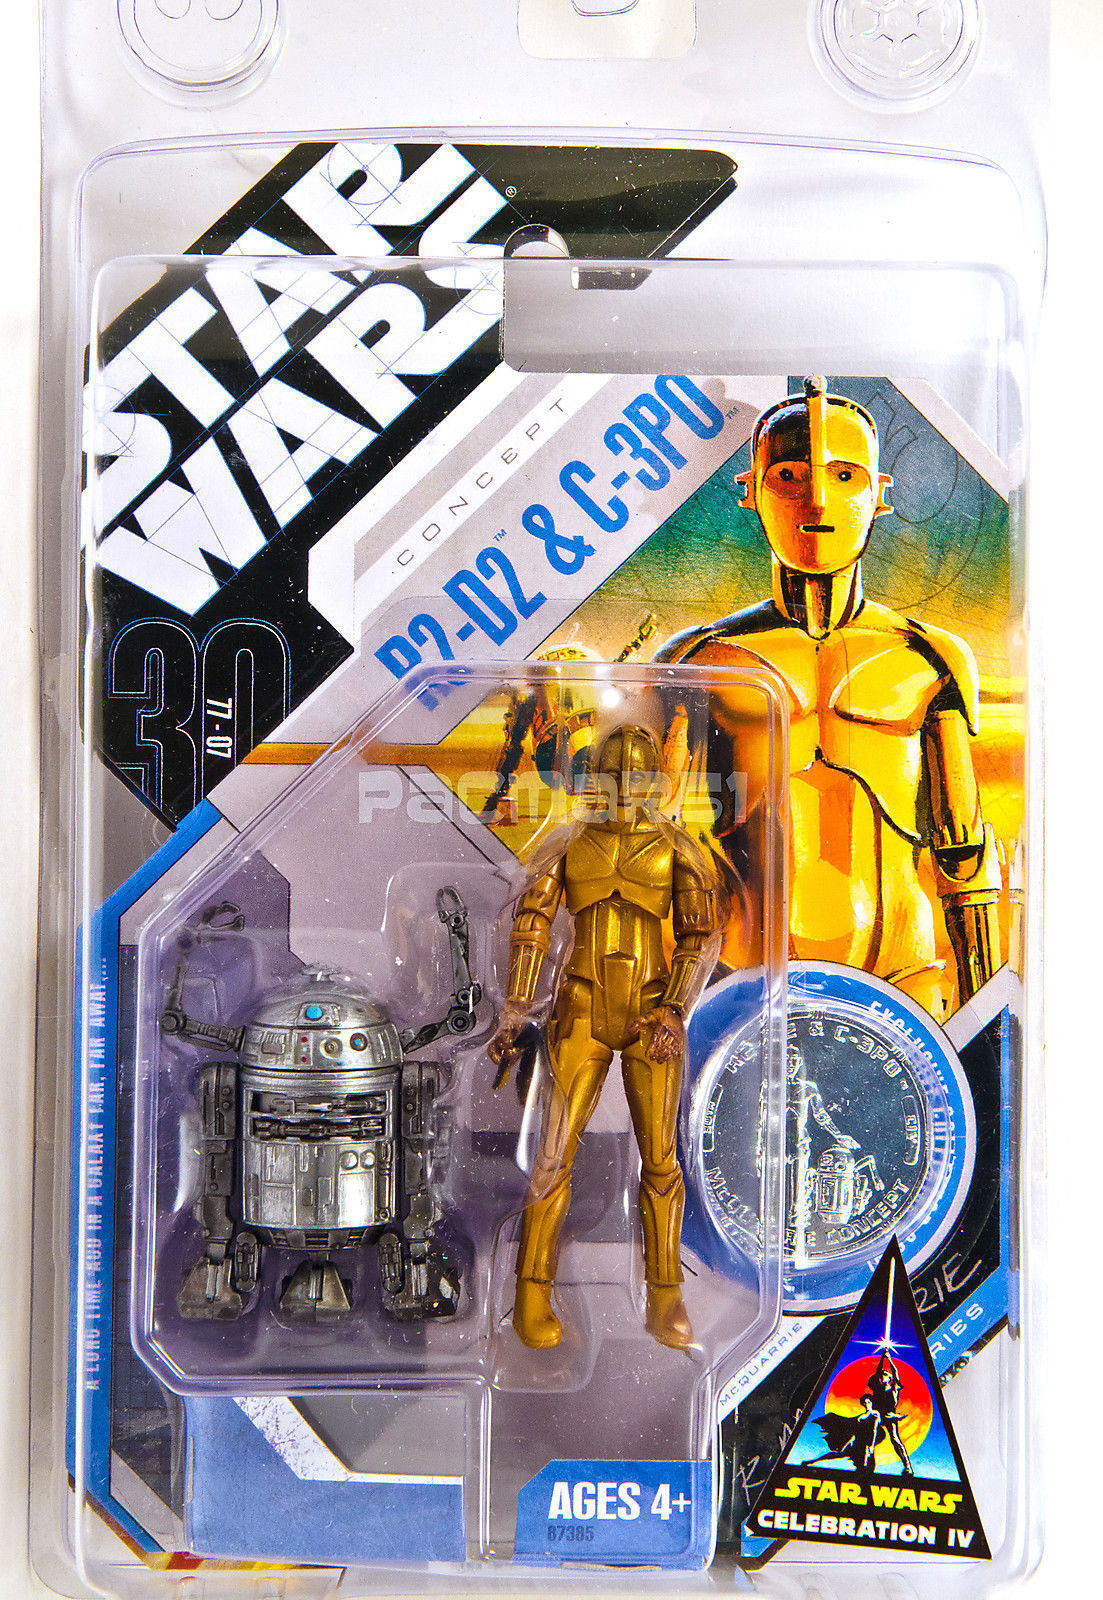 STAR WARS 30TH ANNIV MCQUARRIE CONCEPT 2007  Star Wars Celebration IV R2D2 C3PO